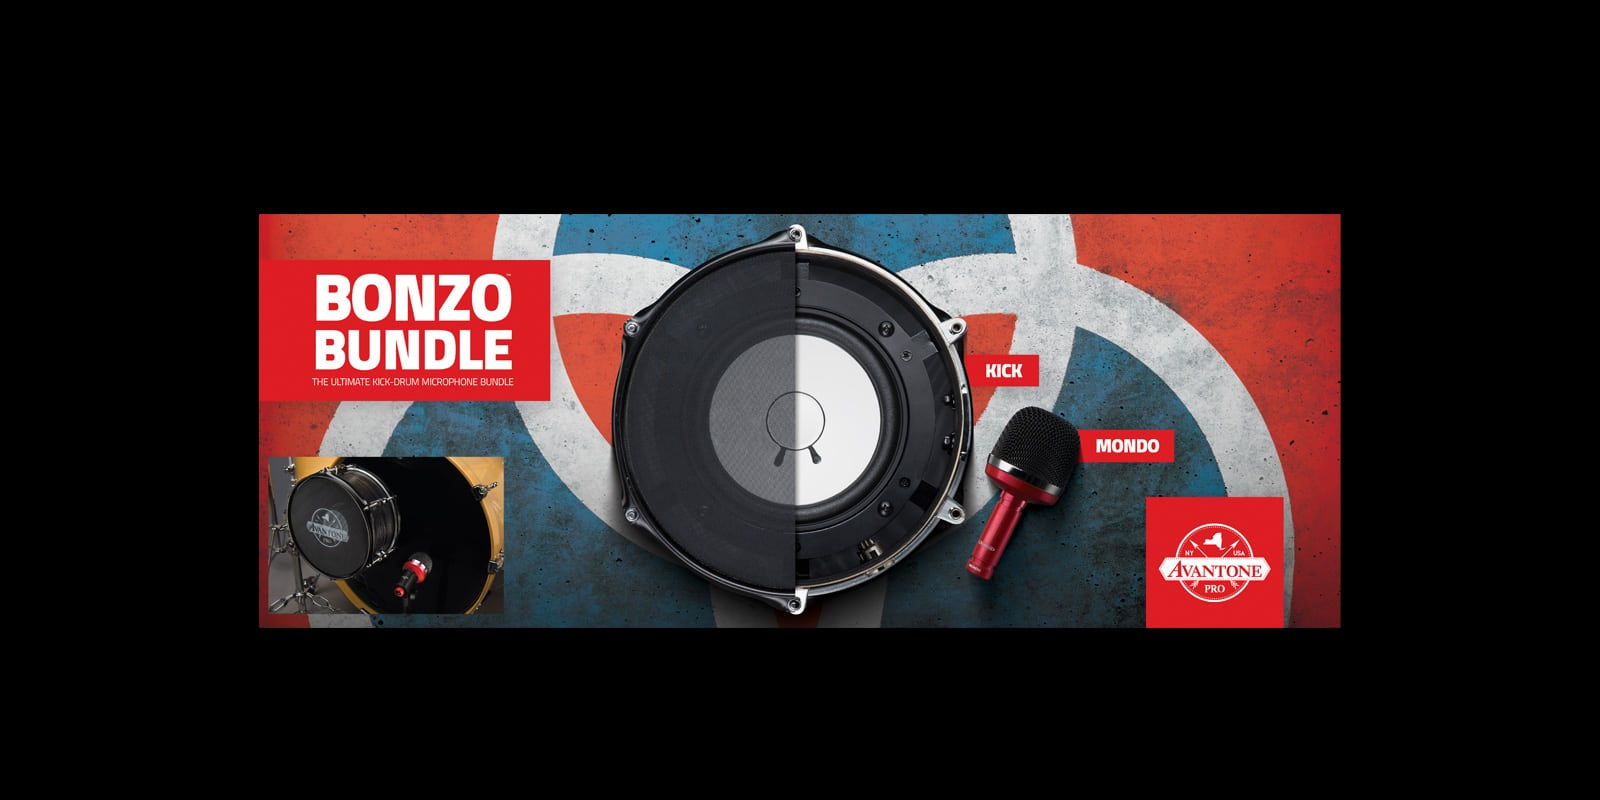 Avatone Pro Bonzo™Bundle